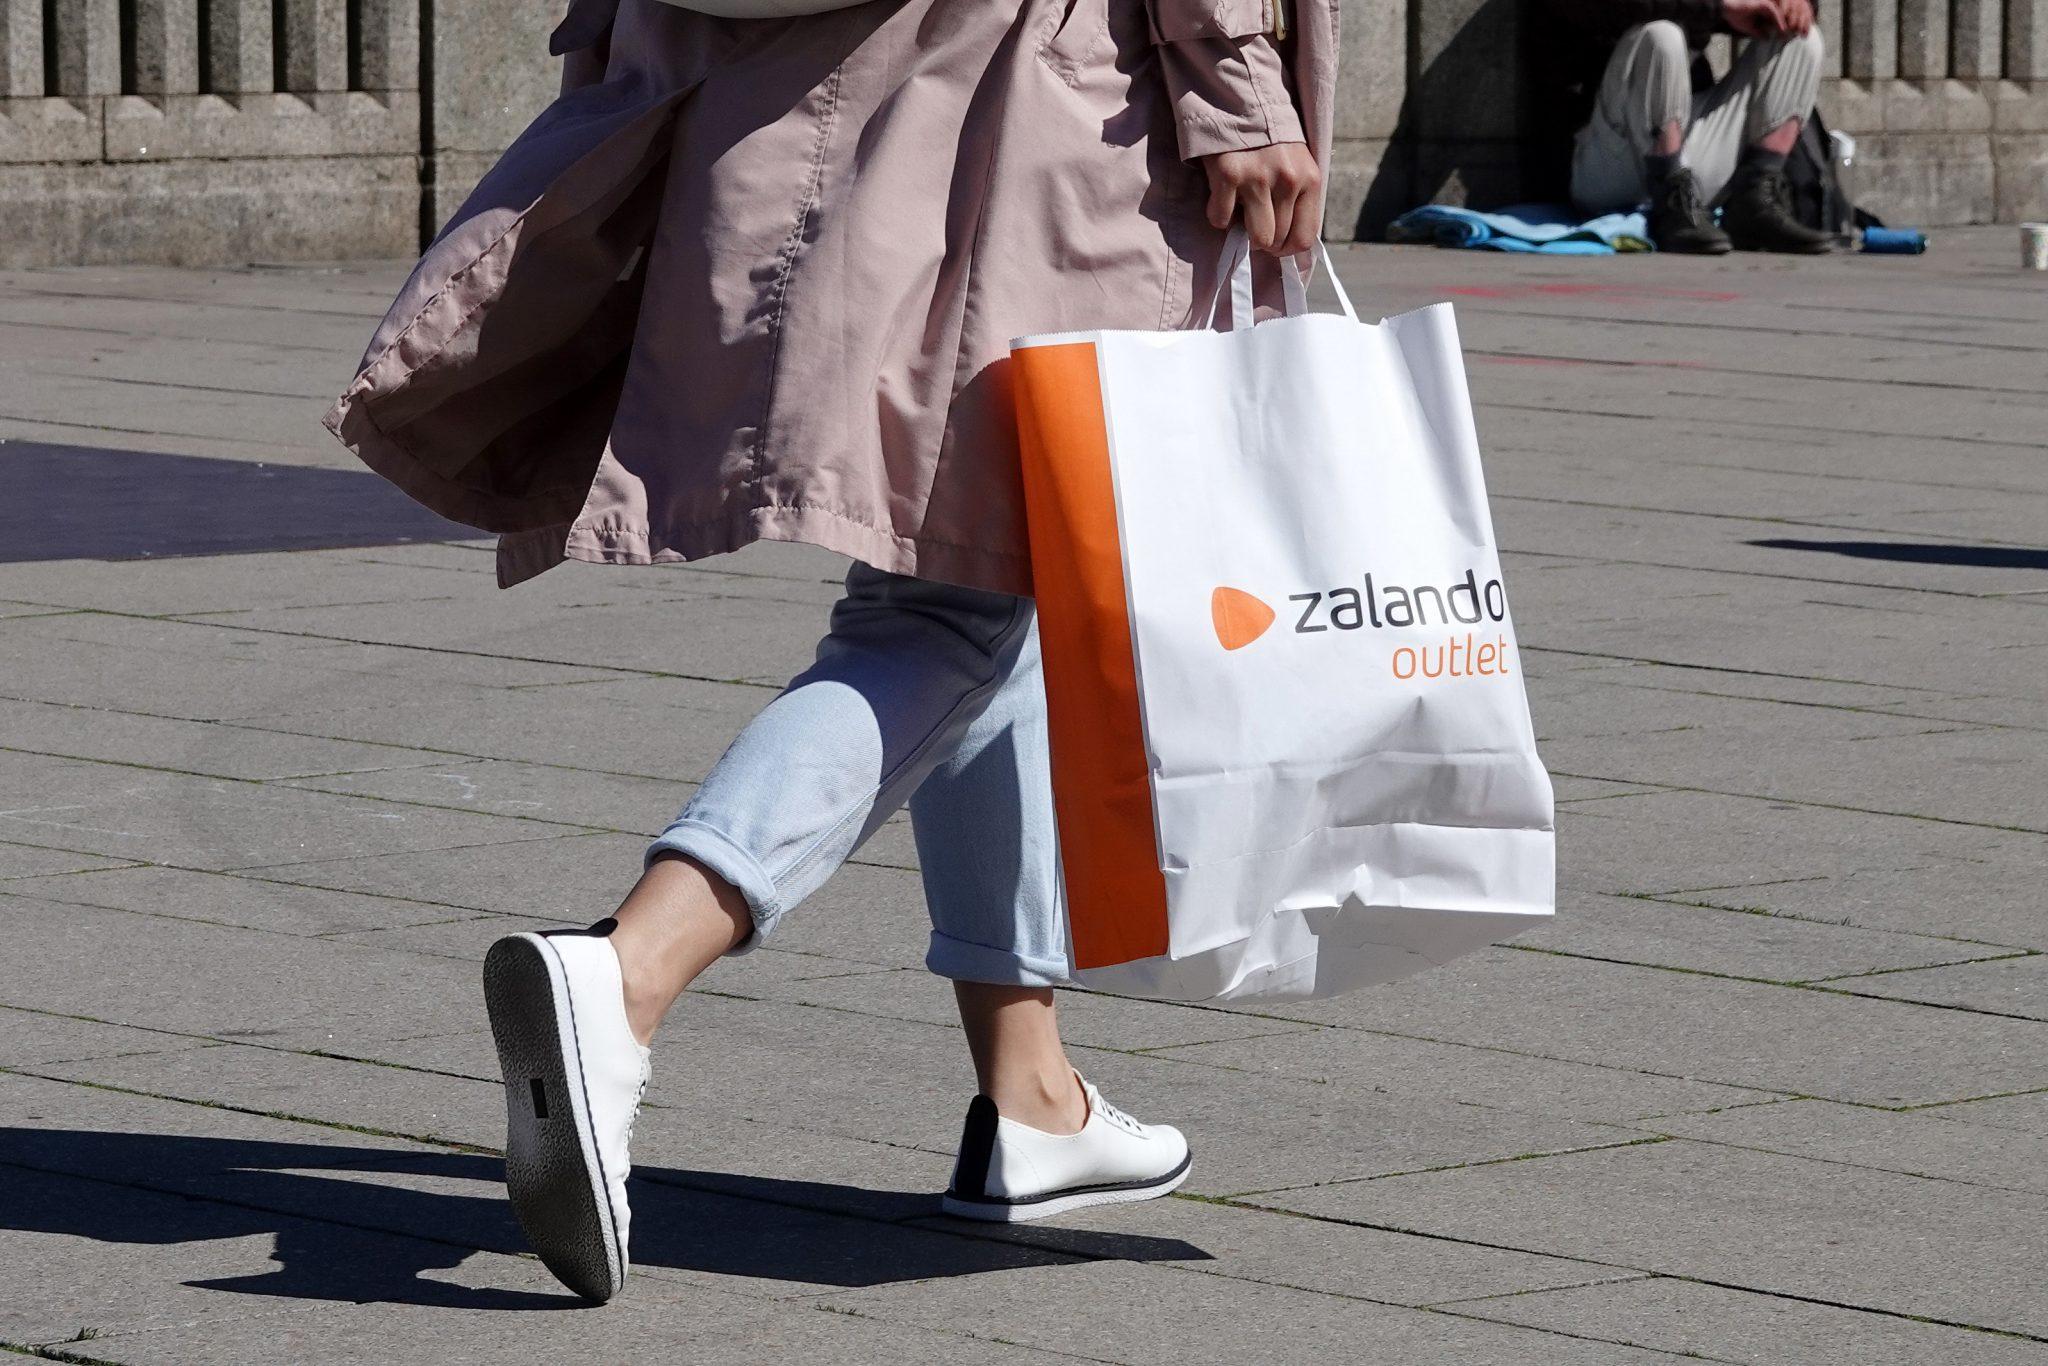 Zalando-Kundin: Unternehmen will gegen Rassismus vorgehen Foto: picture alliance/Bodo Marks/dpa